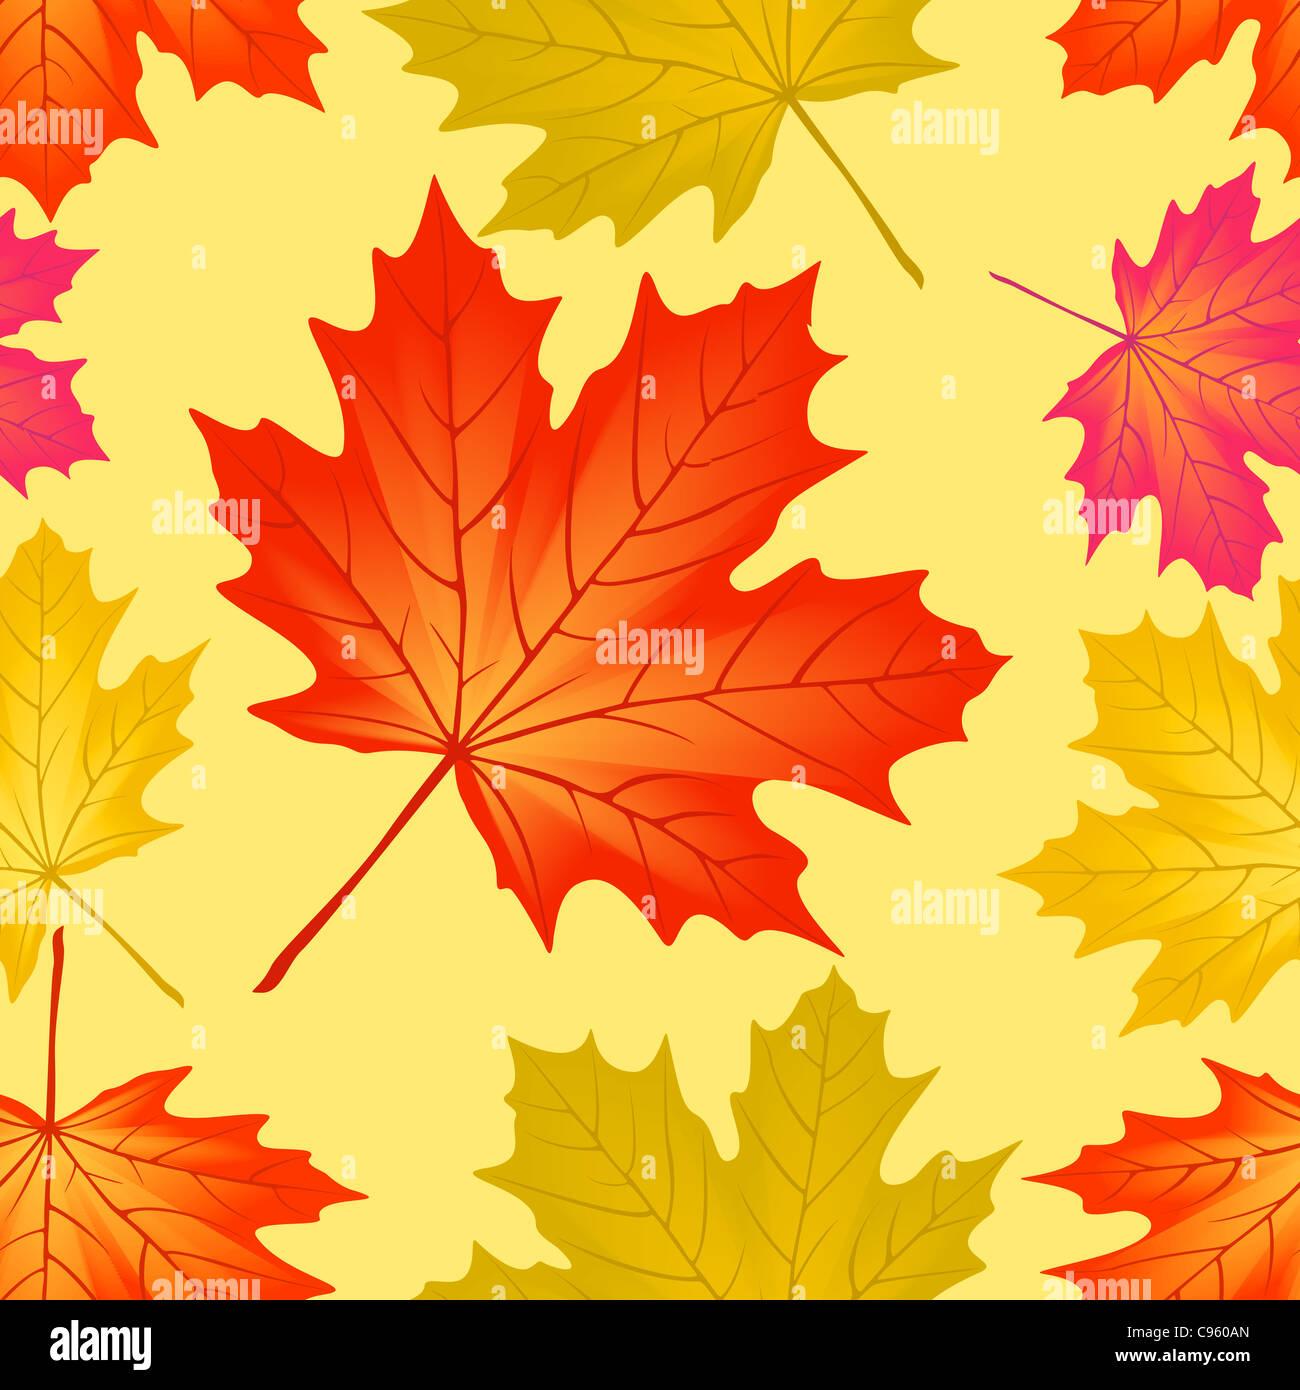 Seamless pattern autumn maple leaves. - Stock Image